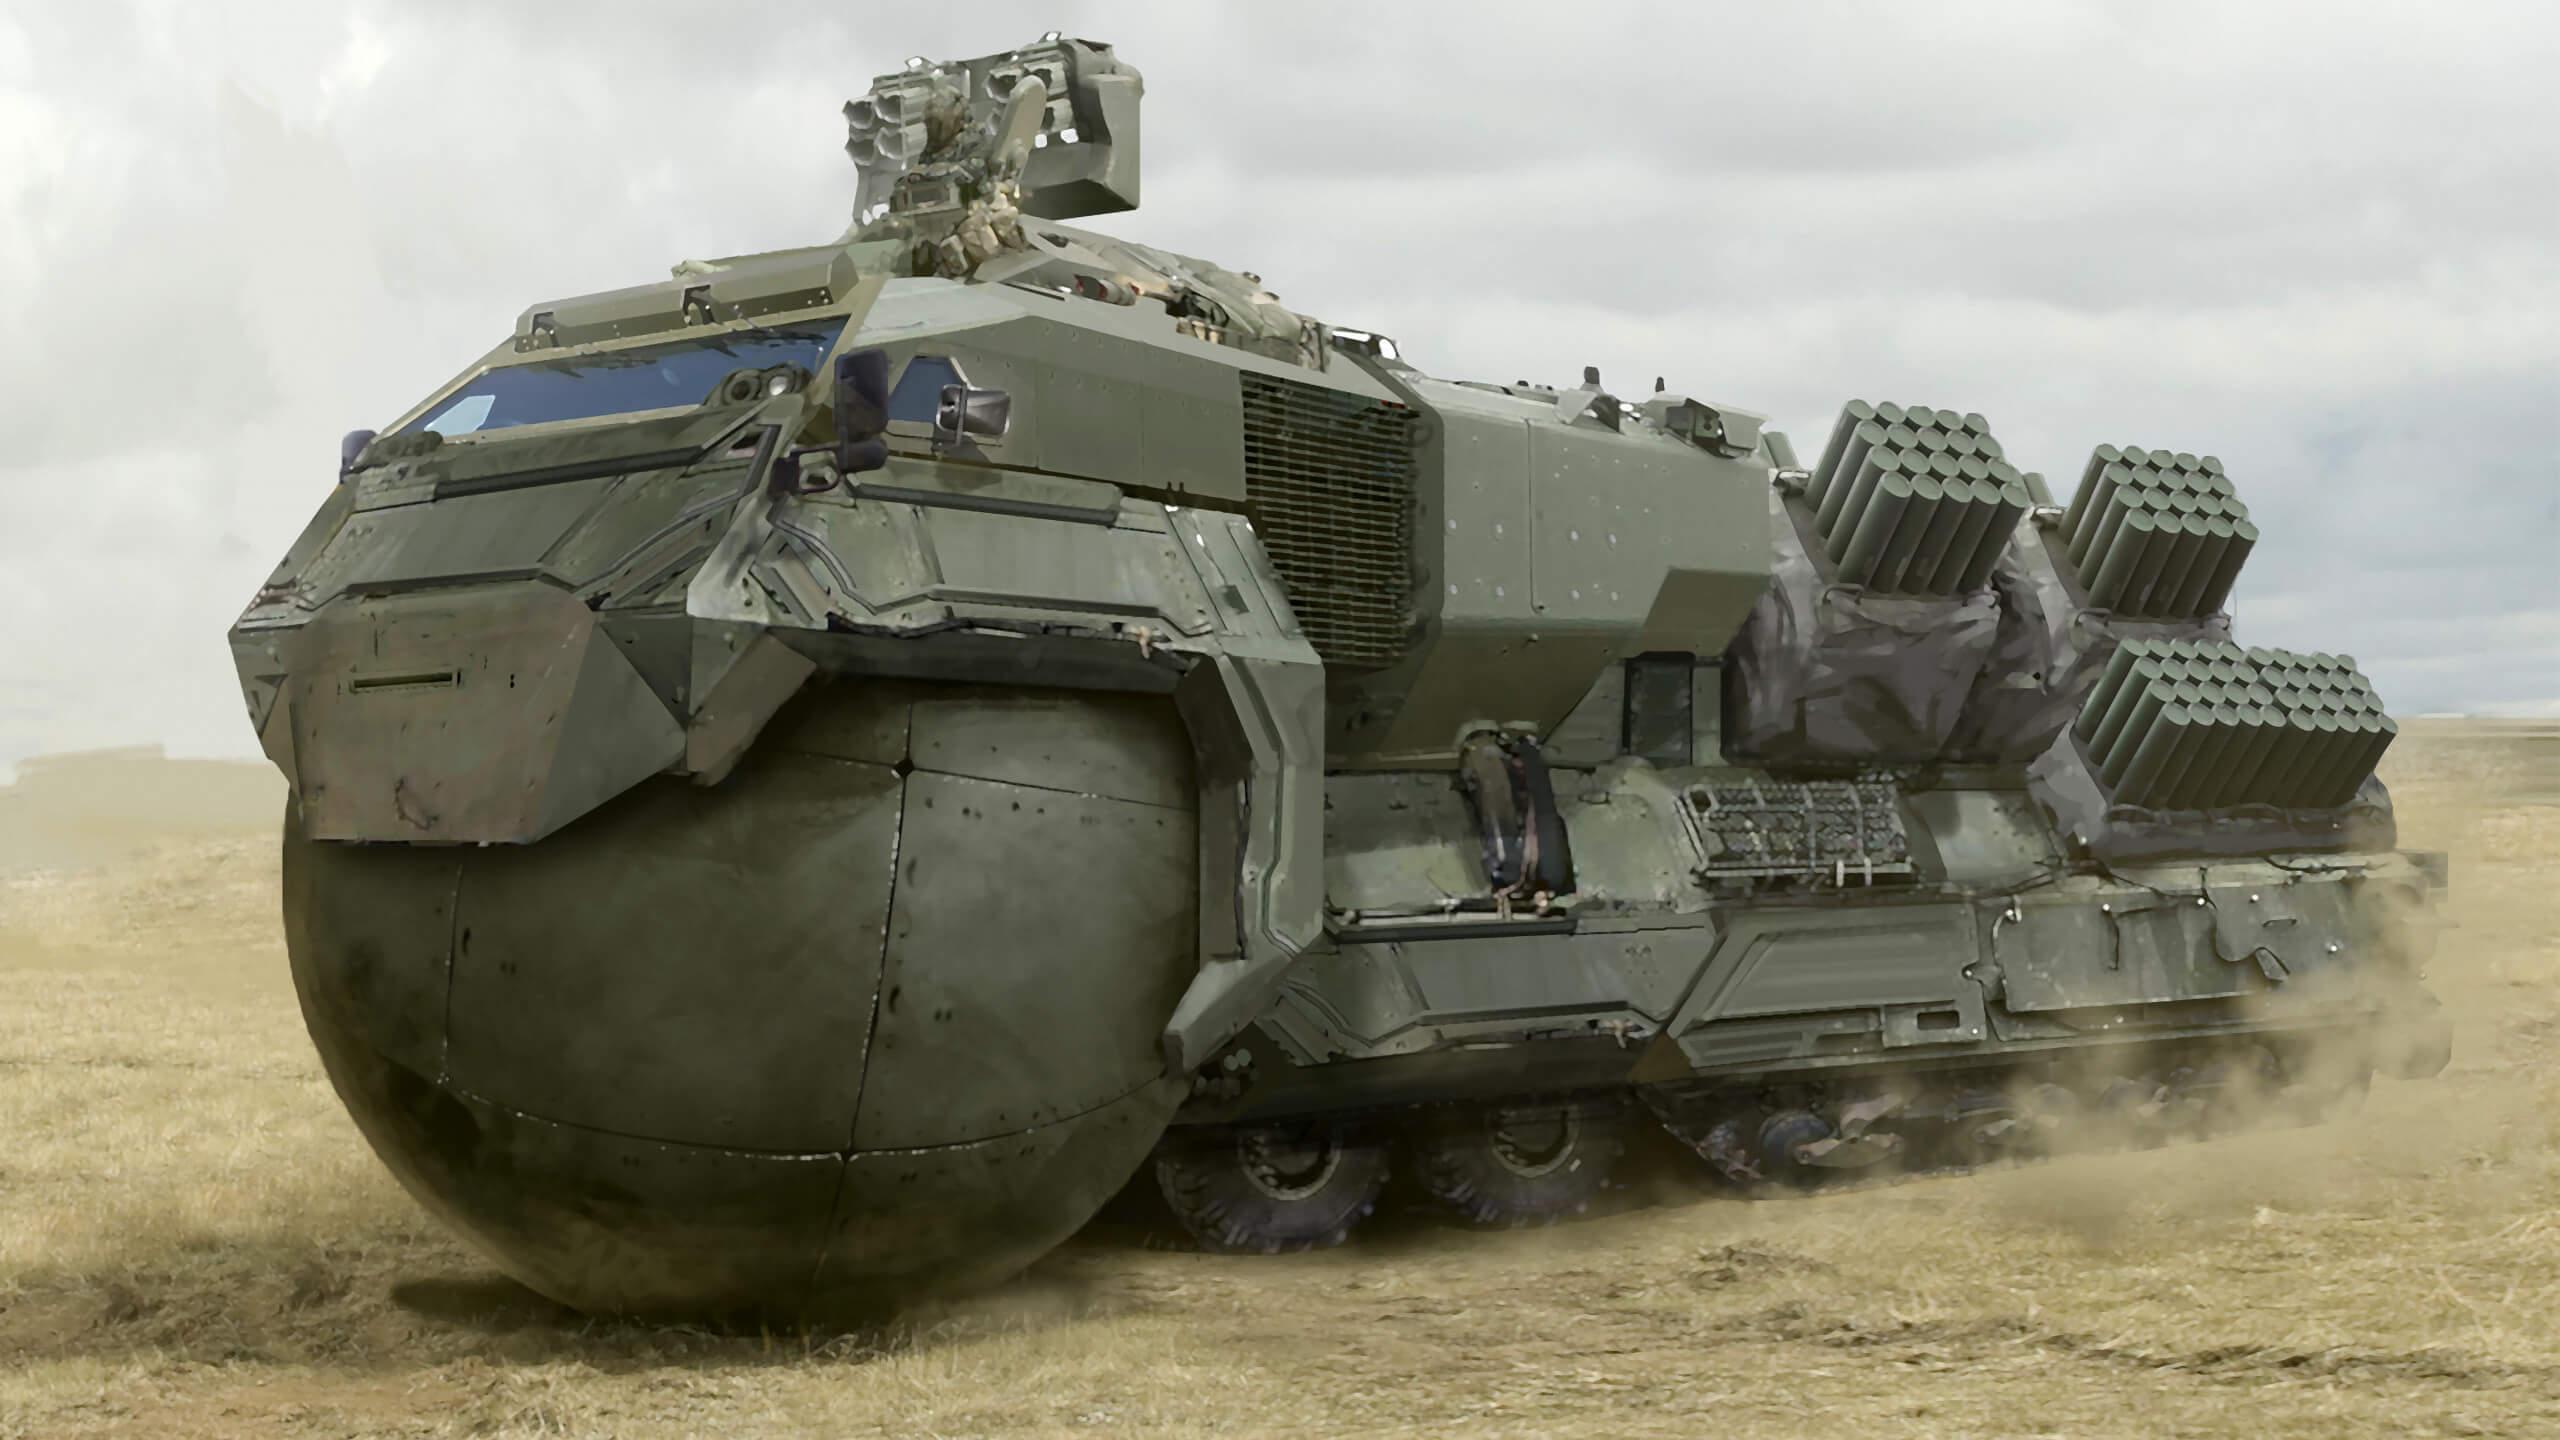 Dieses Militärfahrzeug ist nicht real